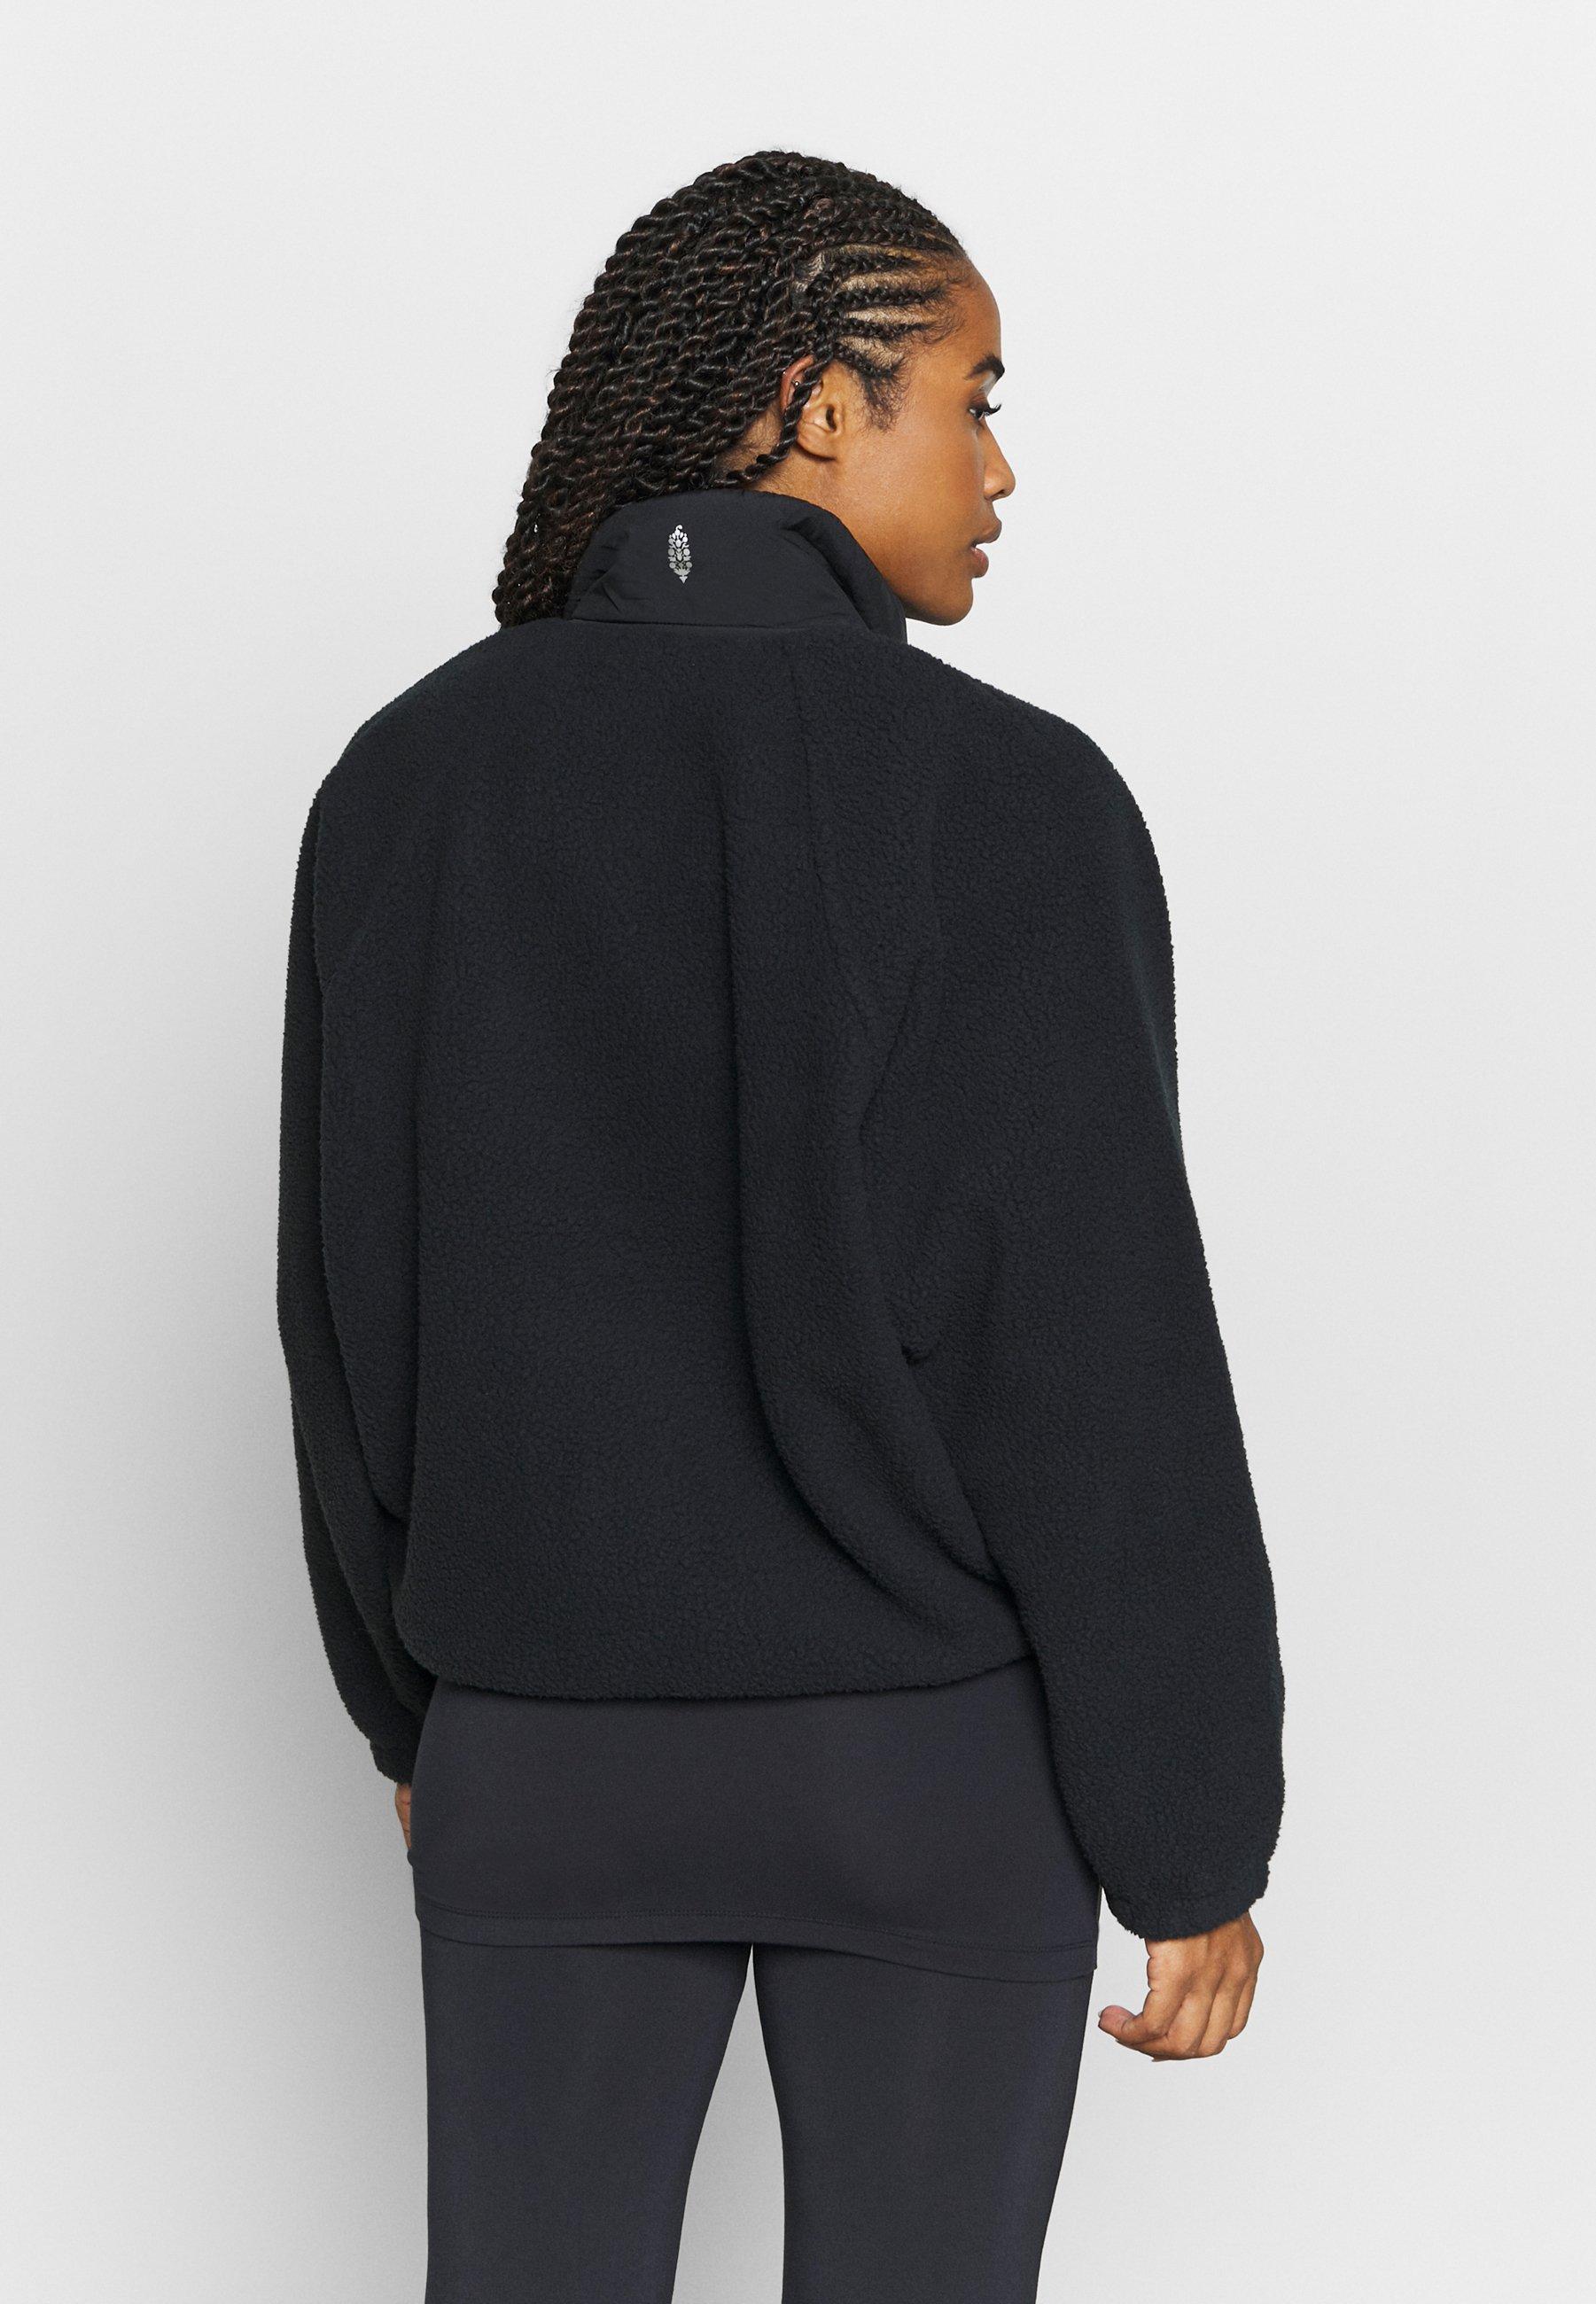 Free People HIT THE SLOPES JACKET - Fleece jacket - black V9fF3